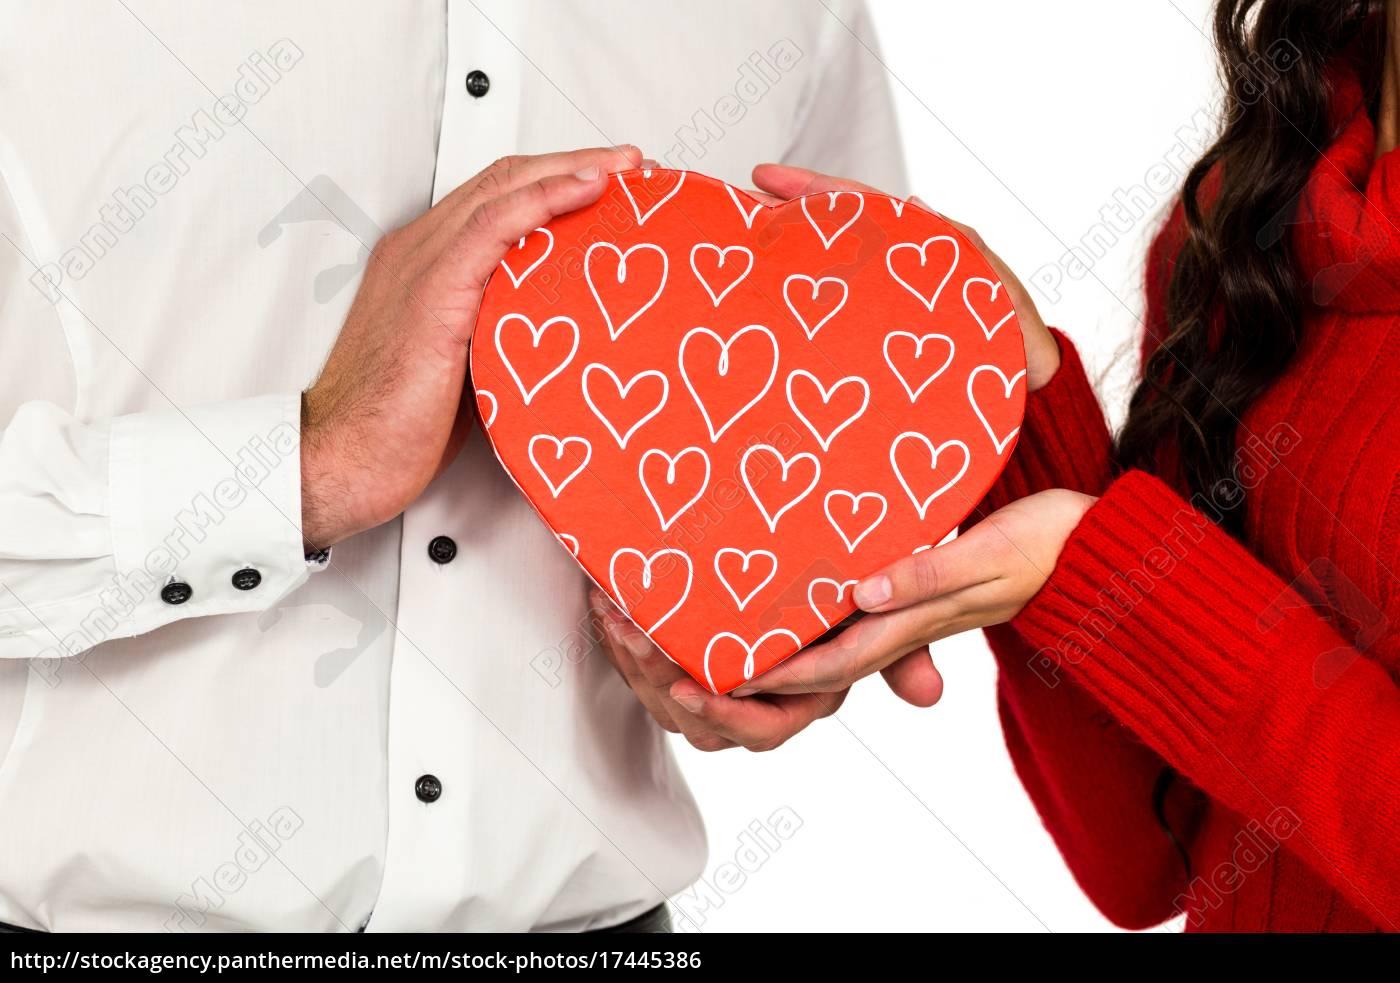 Stock image 17445386 - Couple holding heart shaped gift box & Couple holding heart shaped gift box - Stock image - #17445386 ...